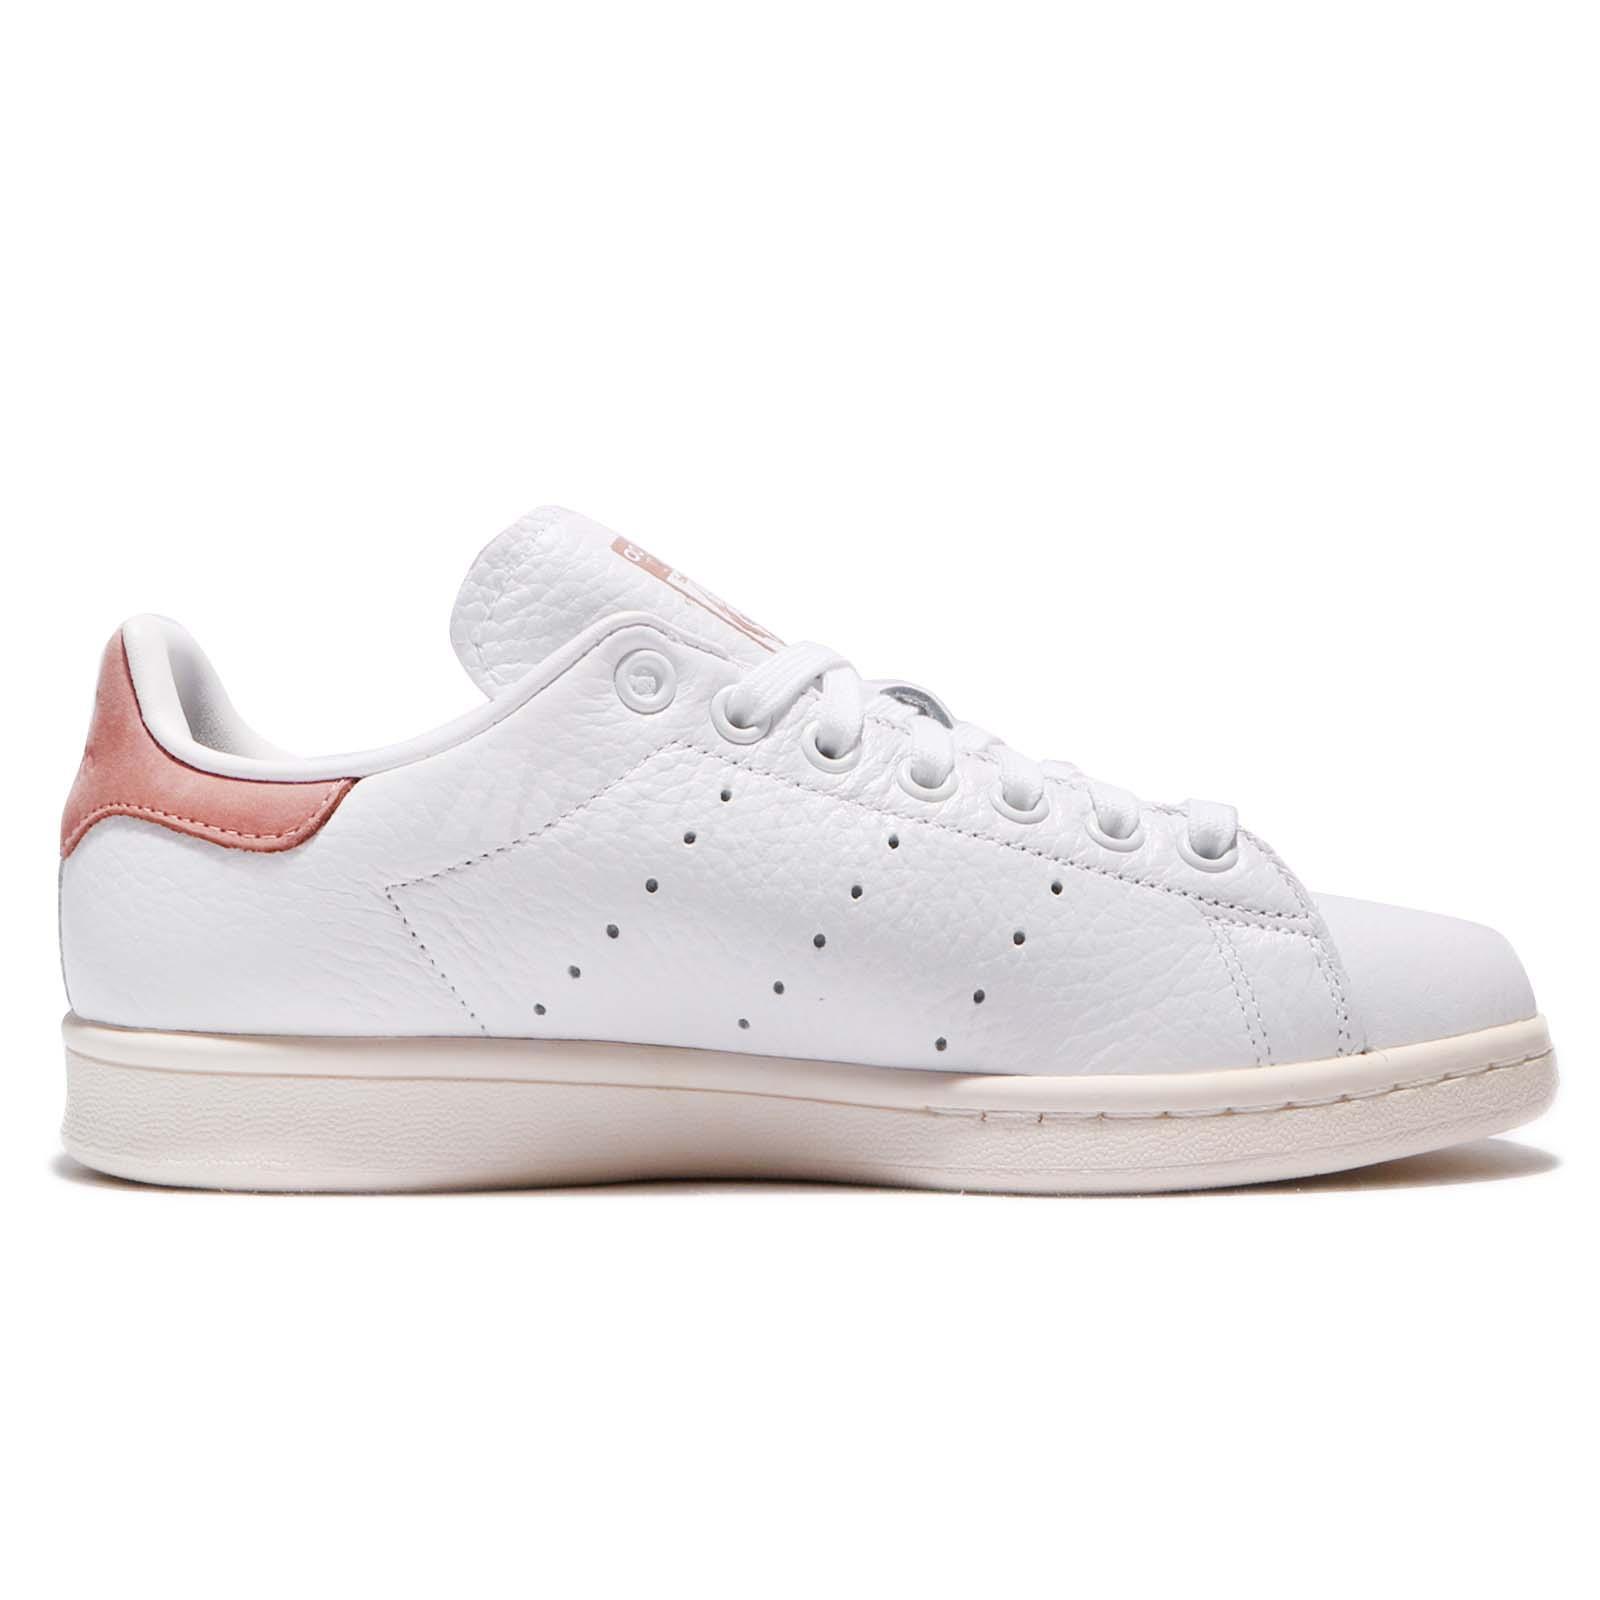 b5063ce53807 adidas Originals Stan Smith White Raw Pink Leather Men Women Shoe Sneaker  CP9702